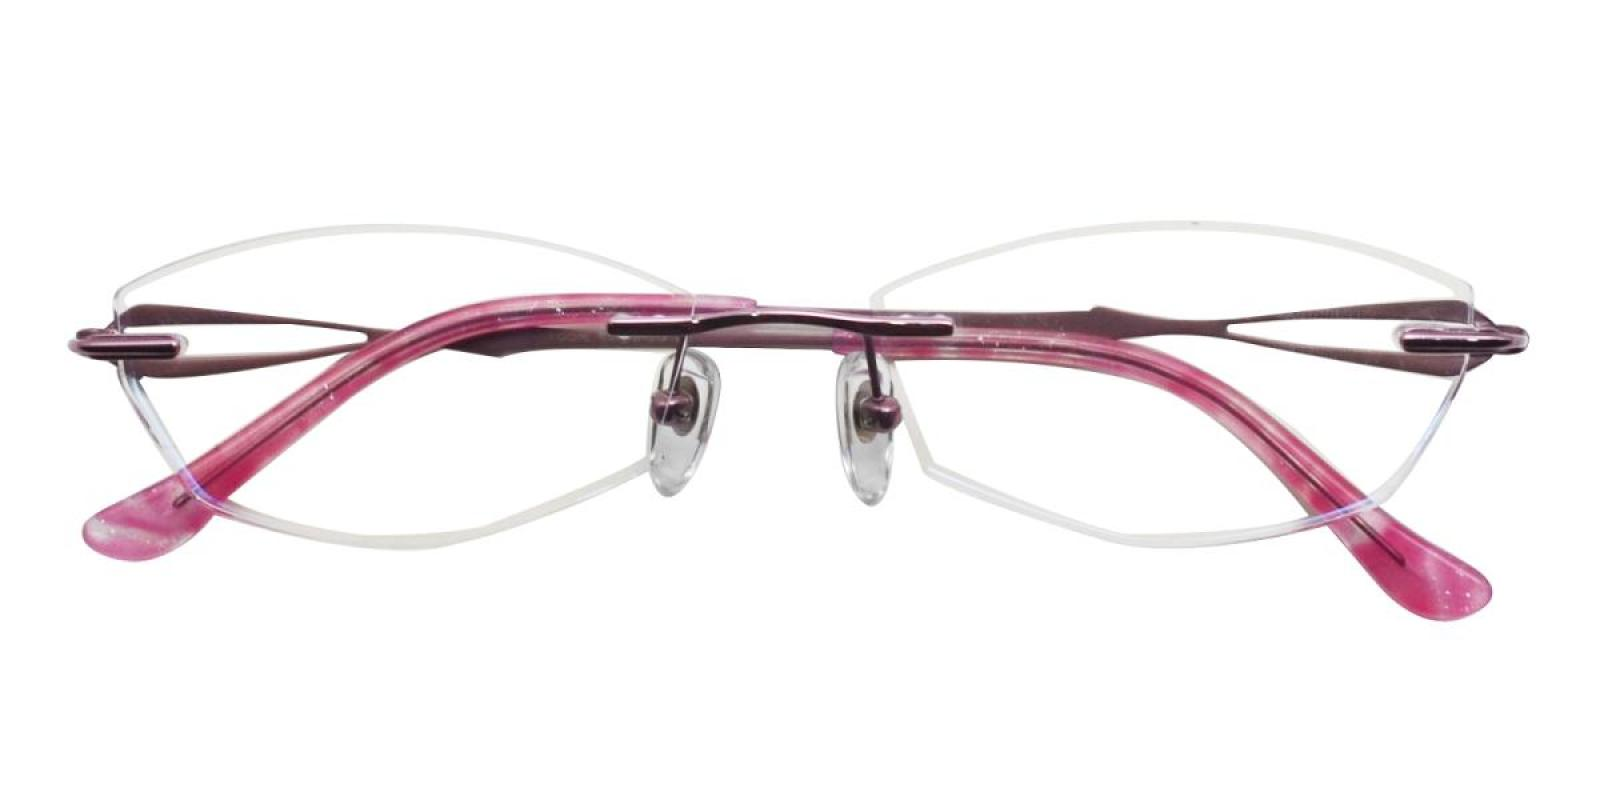 Pininic-Pink-Varieties-Titanium-Eyeglasses-detail